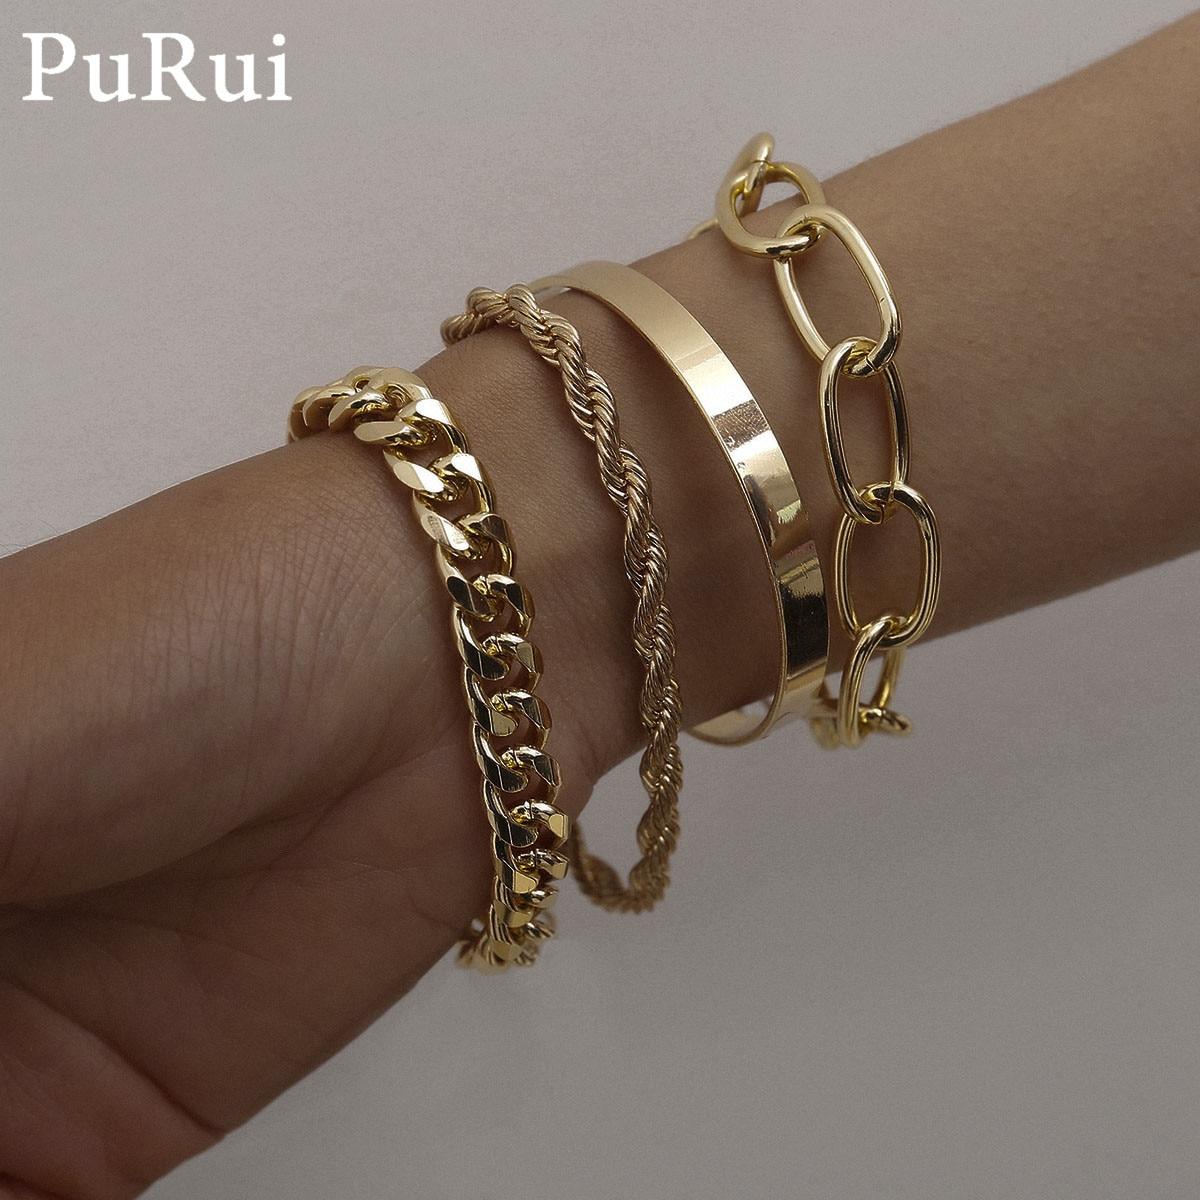 PuRui 4pcs Punk Curb Cuban Chain Bracelets Set for Women Miami Boho Thick Gold Color Charm Bracelets Bangles Fashion Jewelry(China)